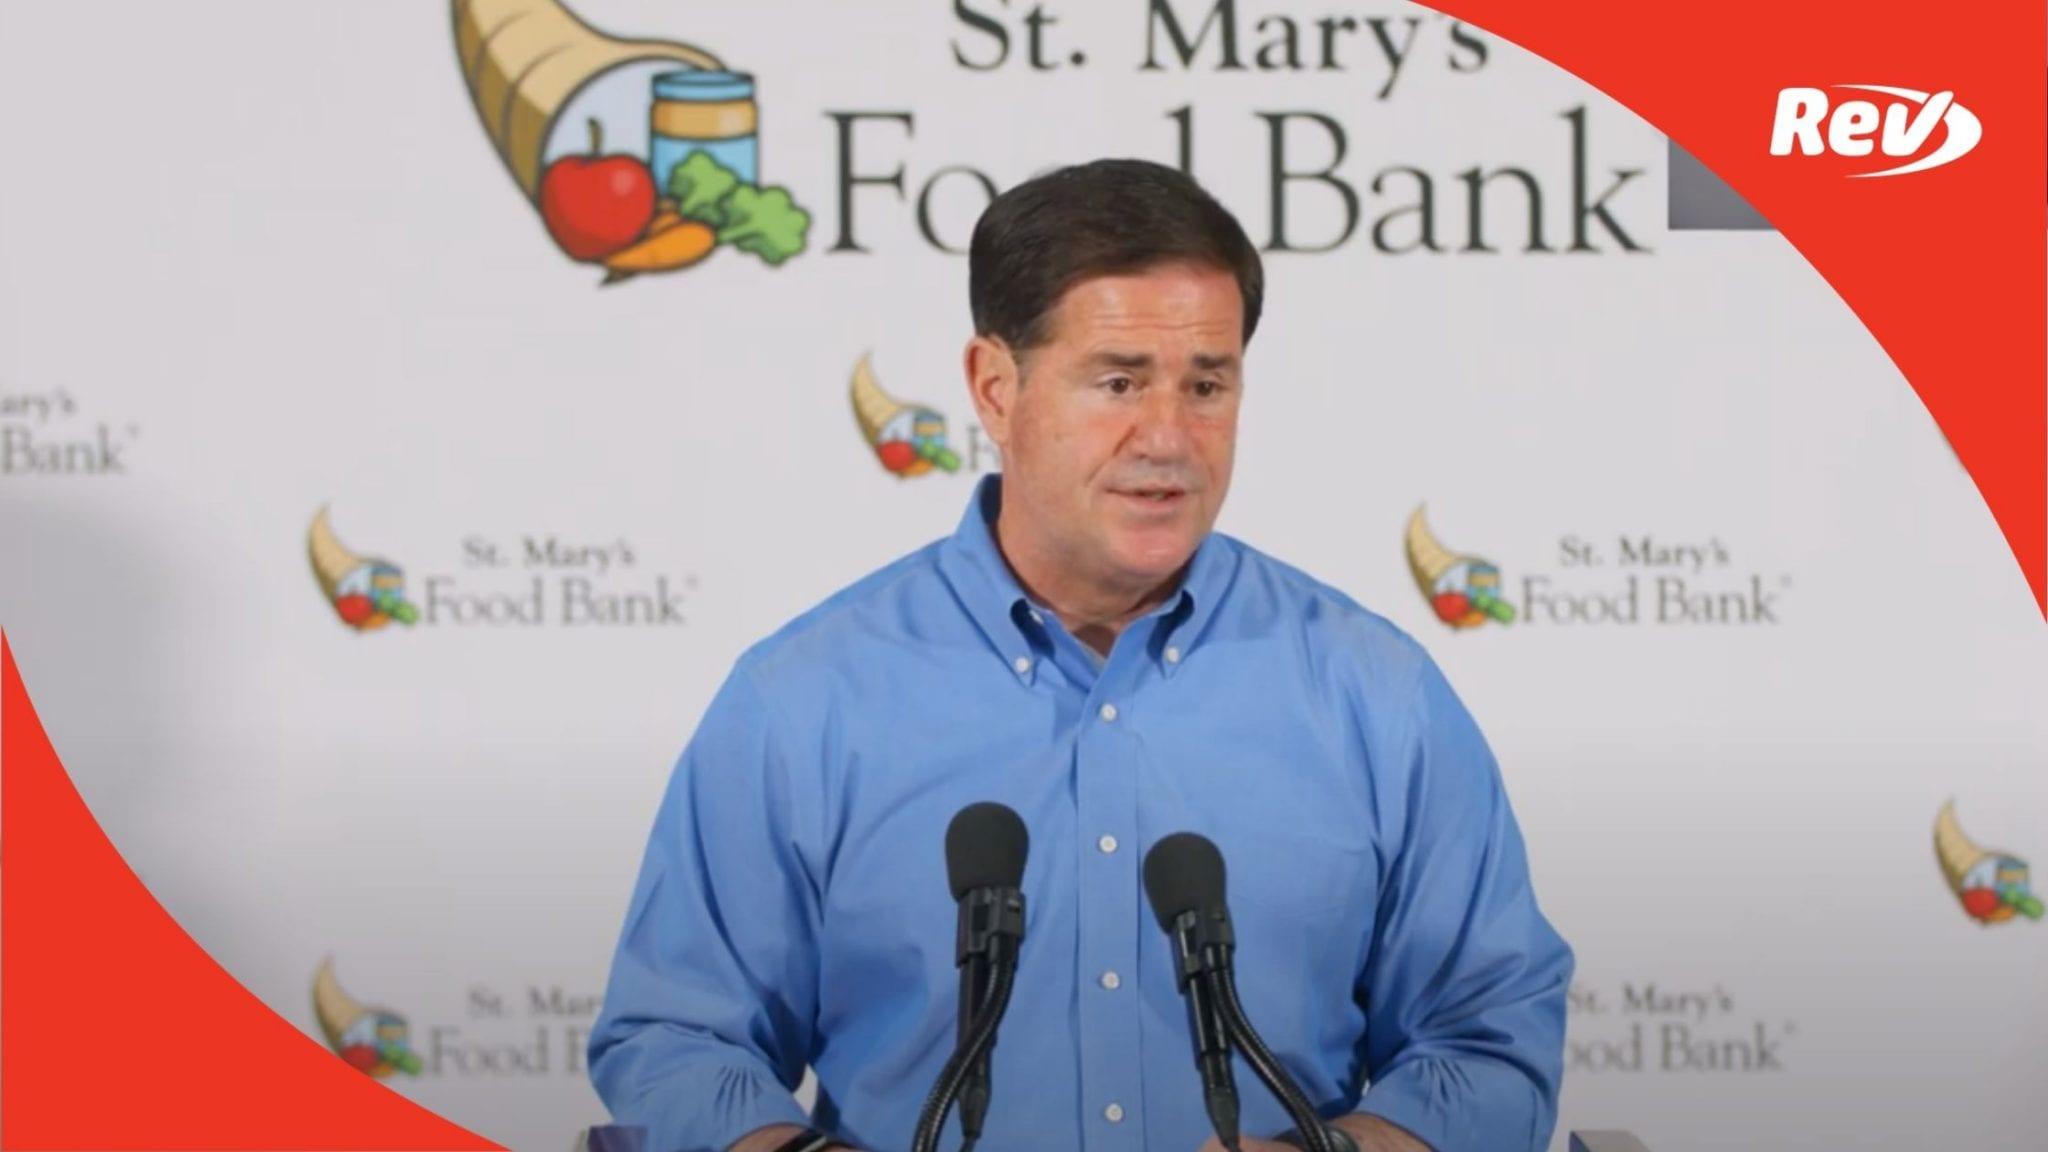 Arizona Gov. Doug Ducey Covid-19 Press Conference Transcript October 29